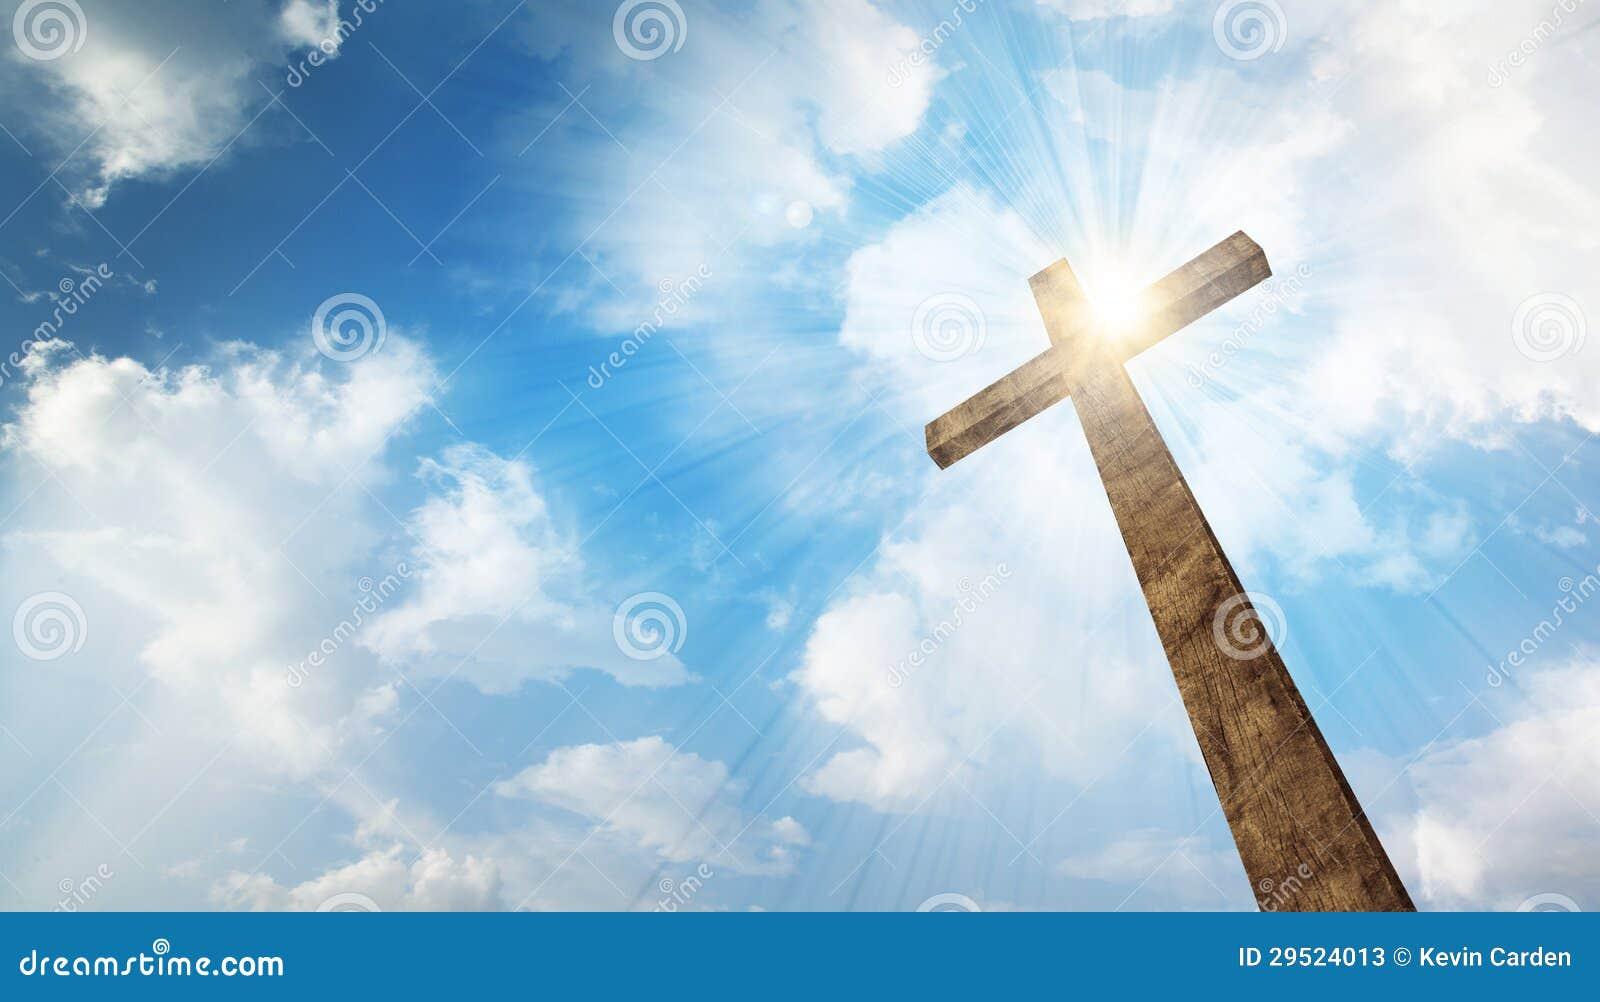 Resurrection power lyrics